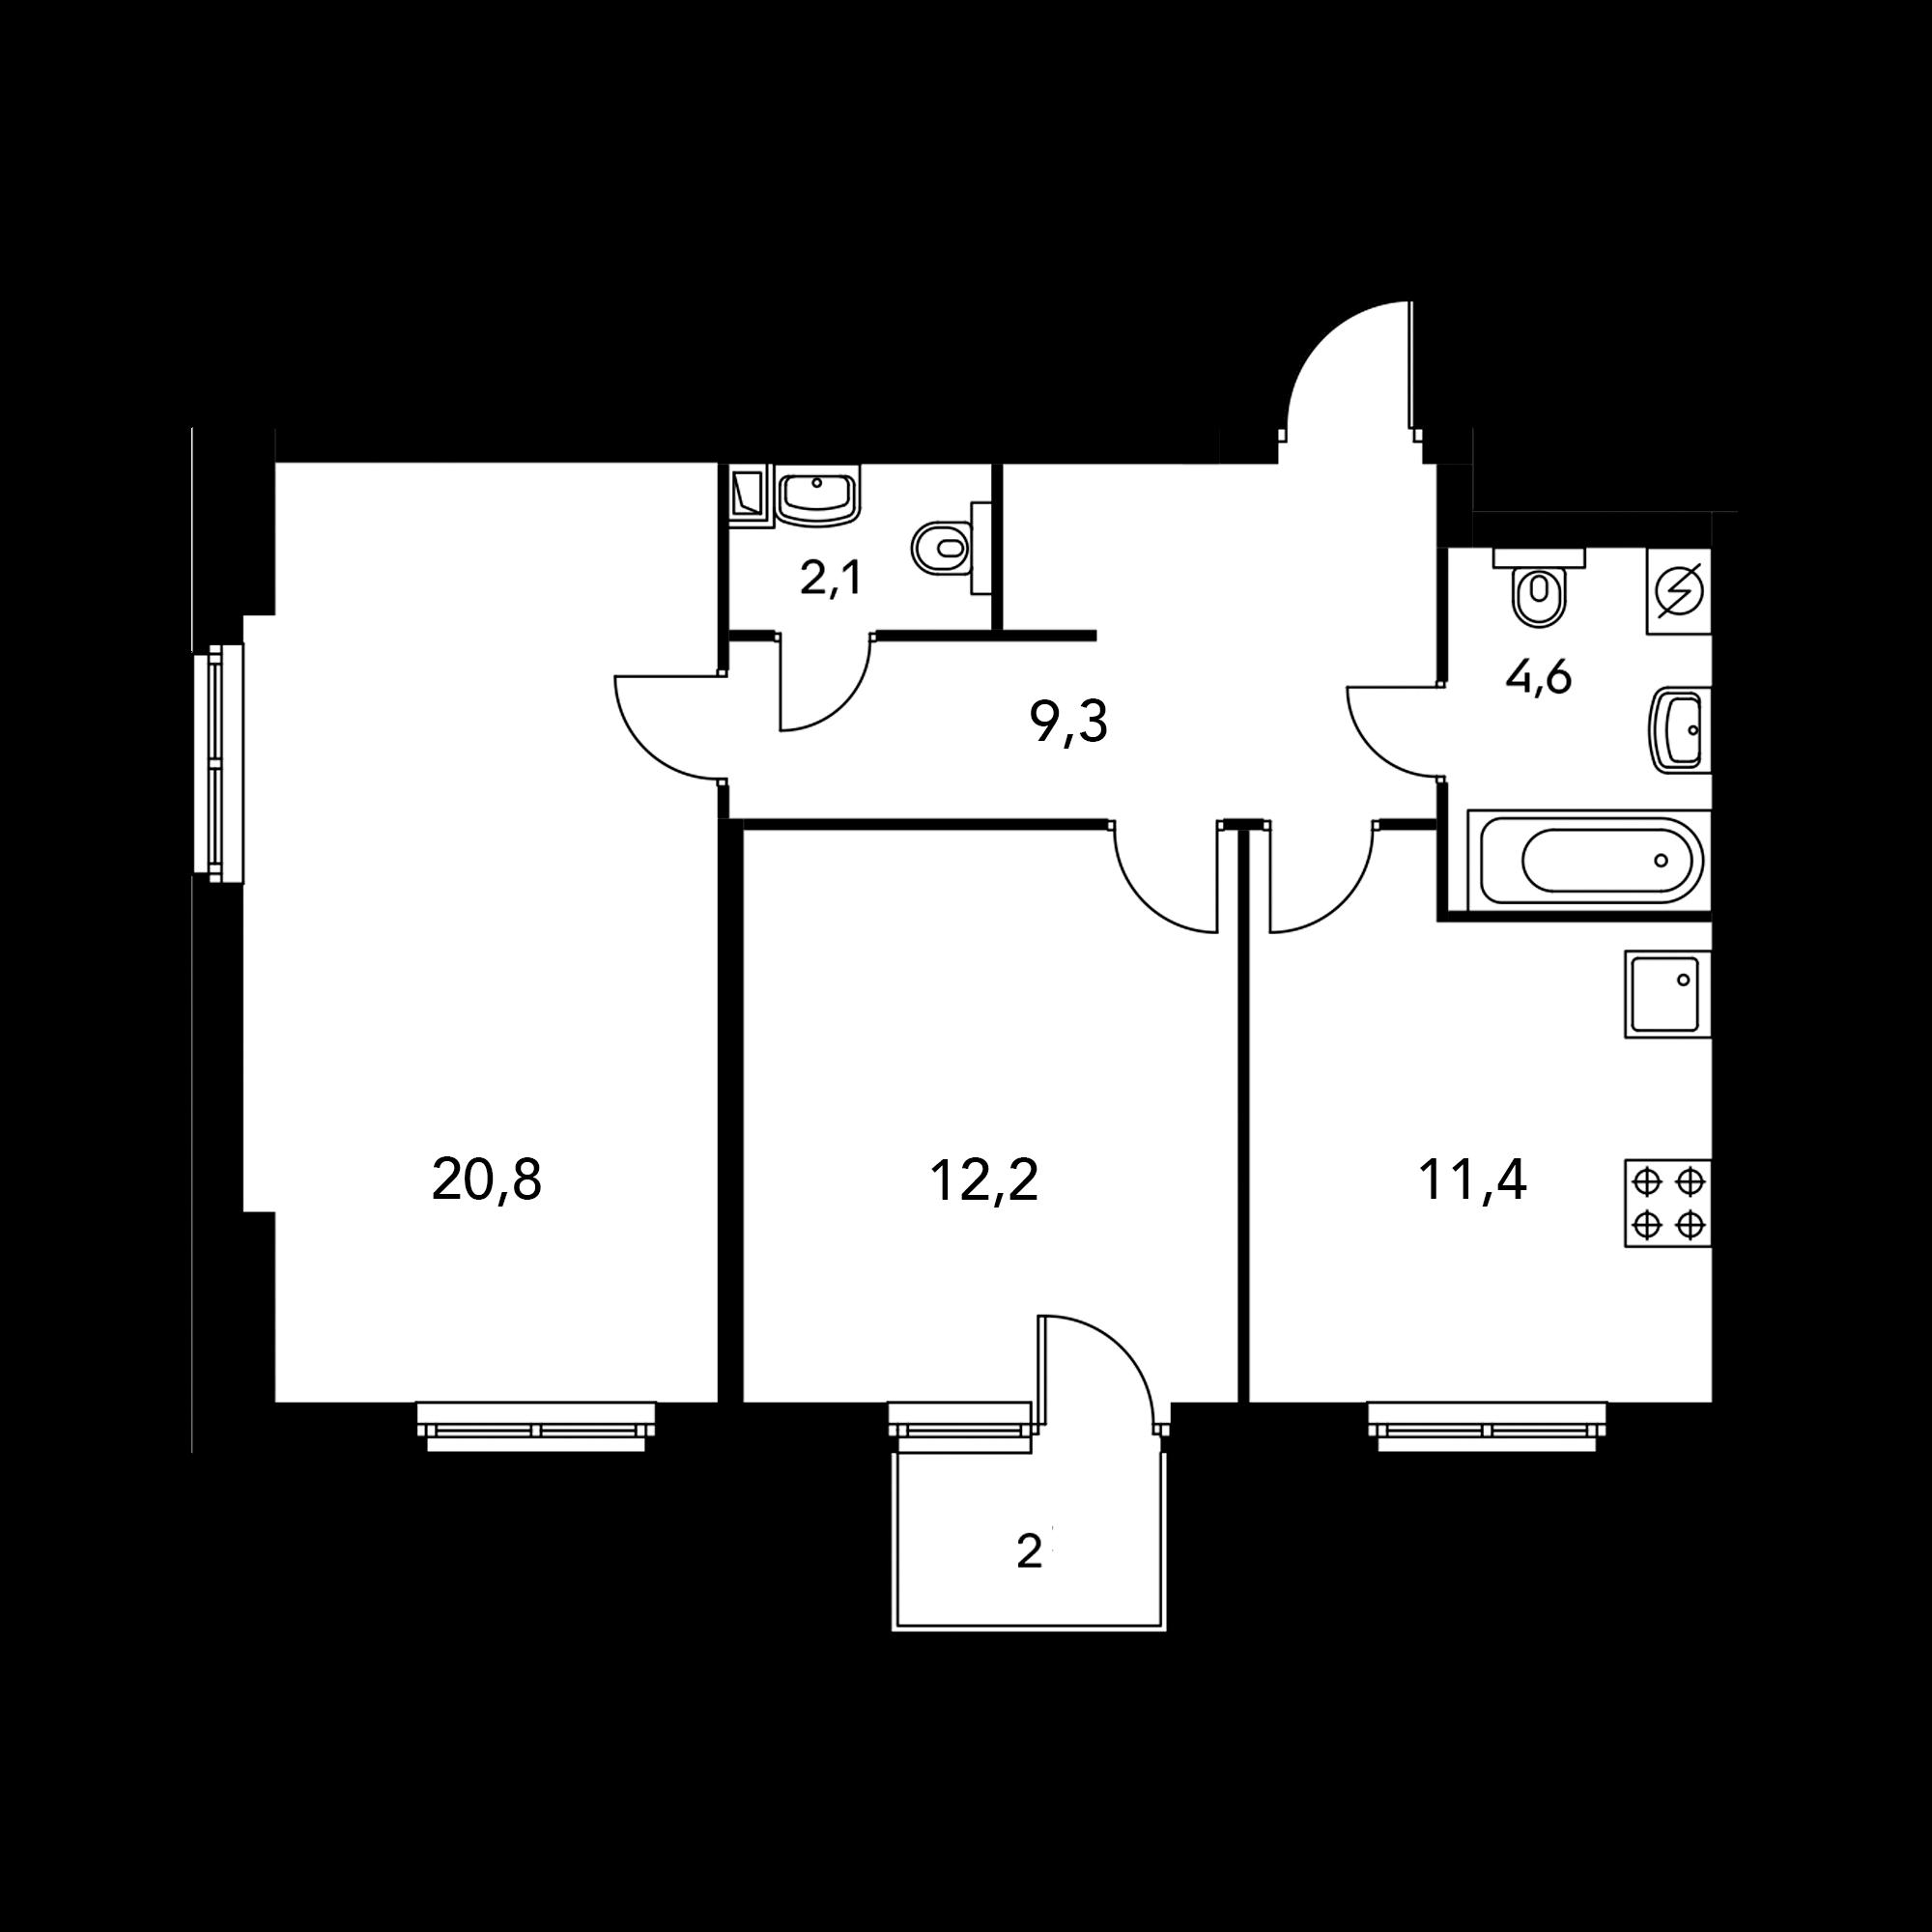 2KM6_9.9-B1